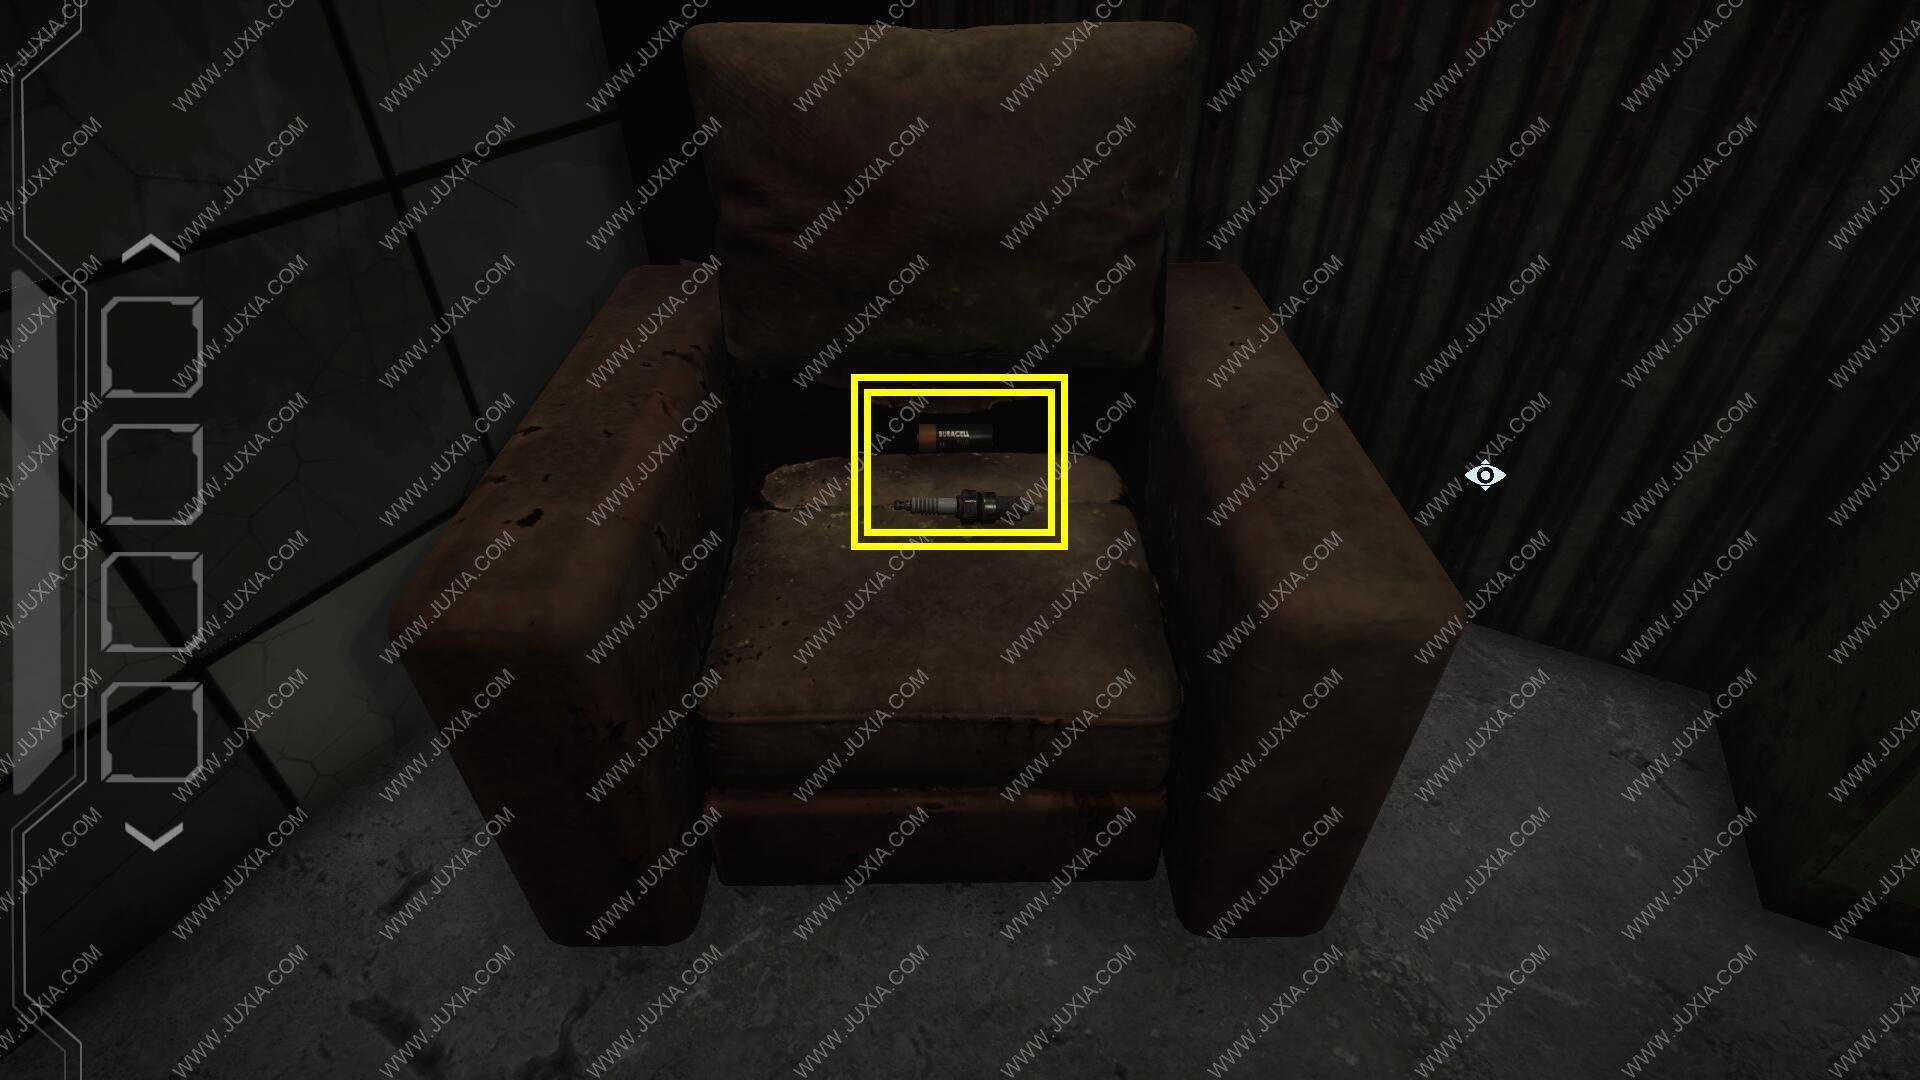 Escape2088攻略第一章 逃生2088柜子密码攻略